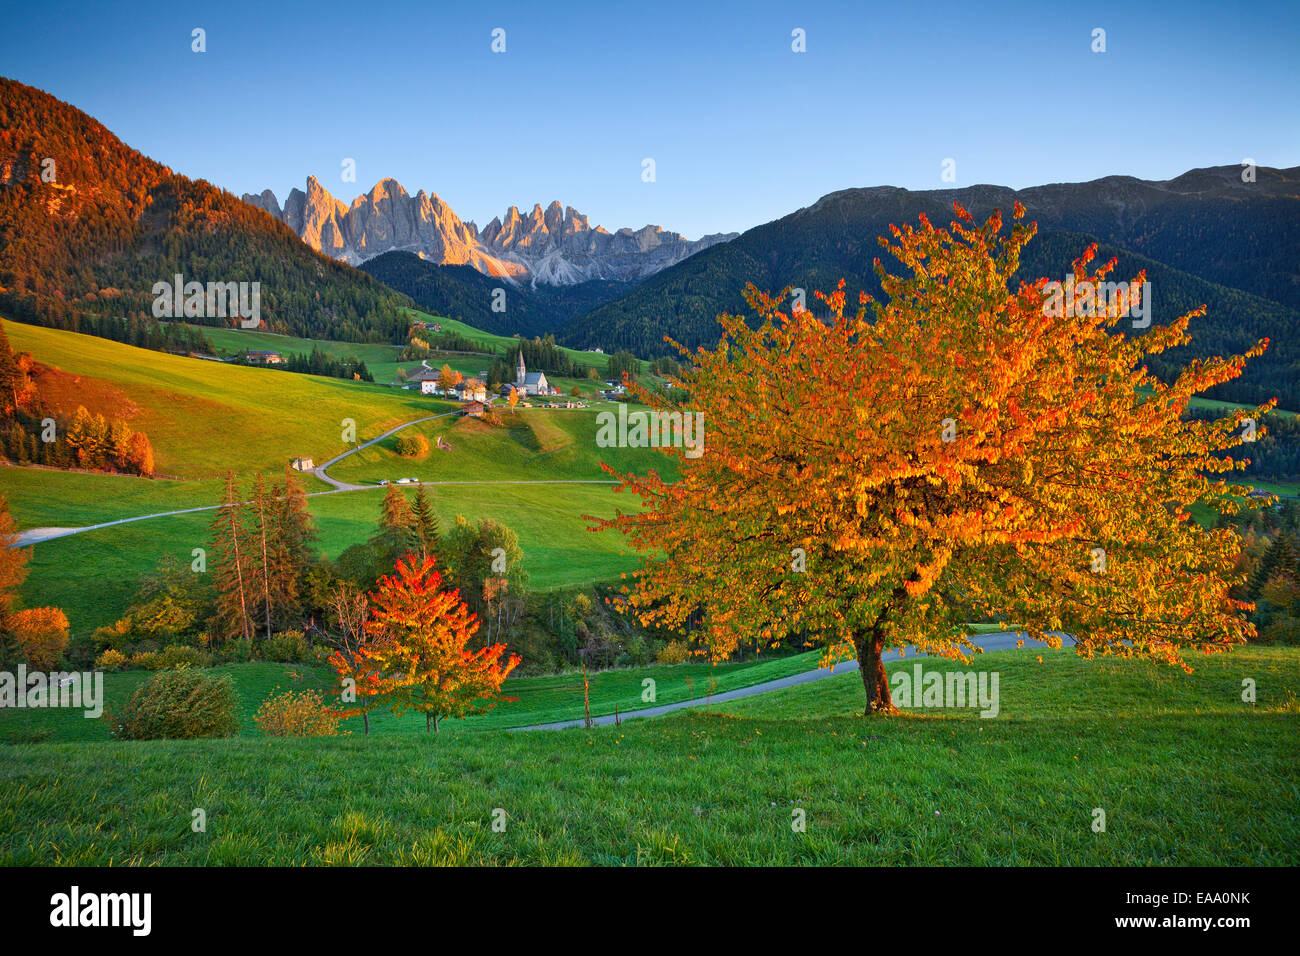 Autumn in  European Alps. - Stock Image